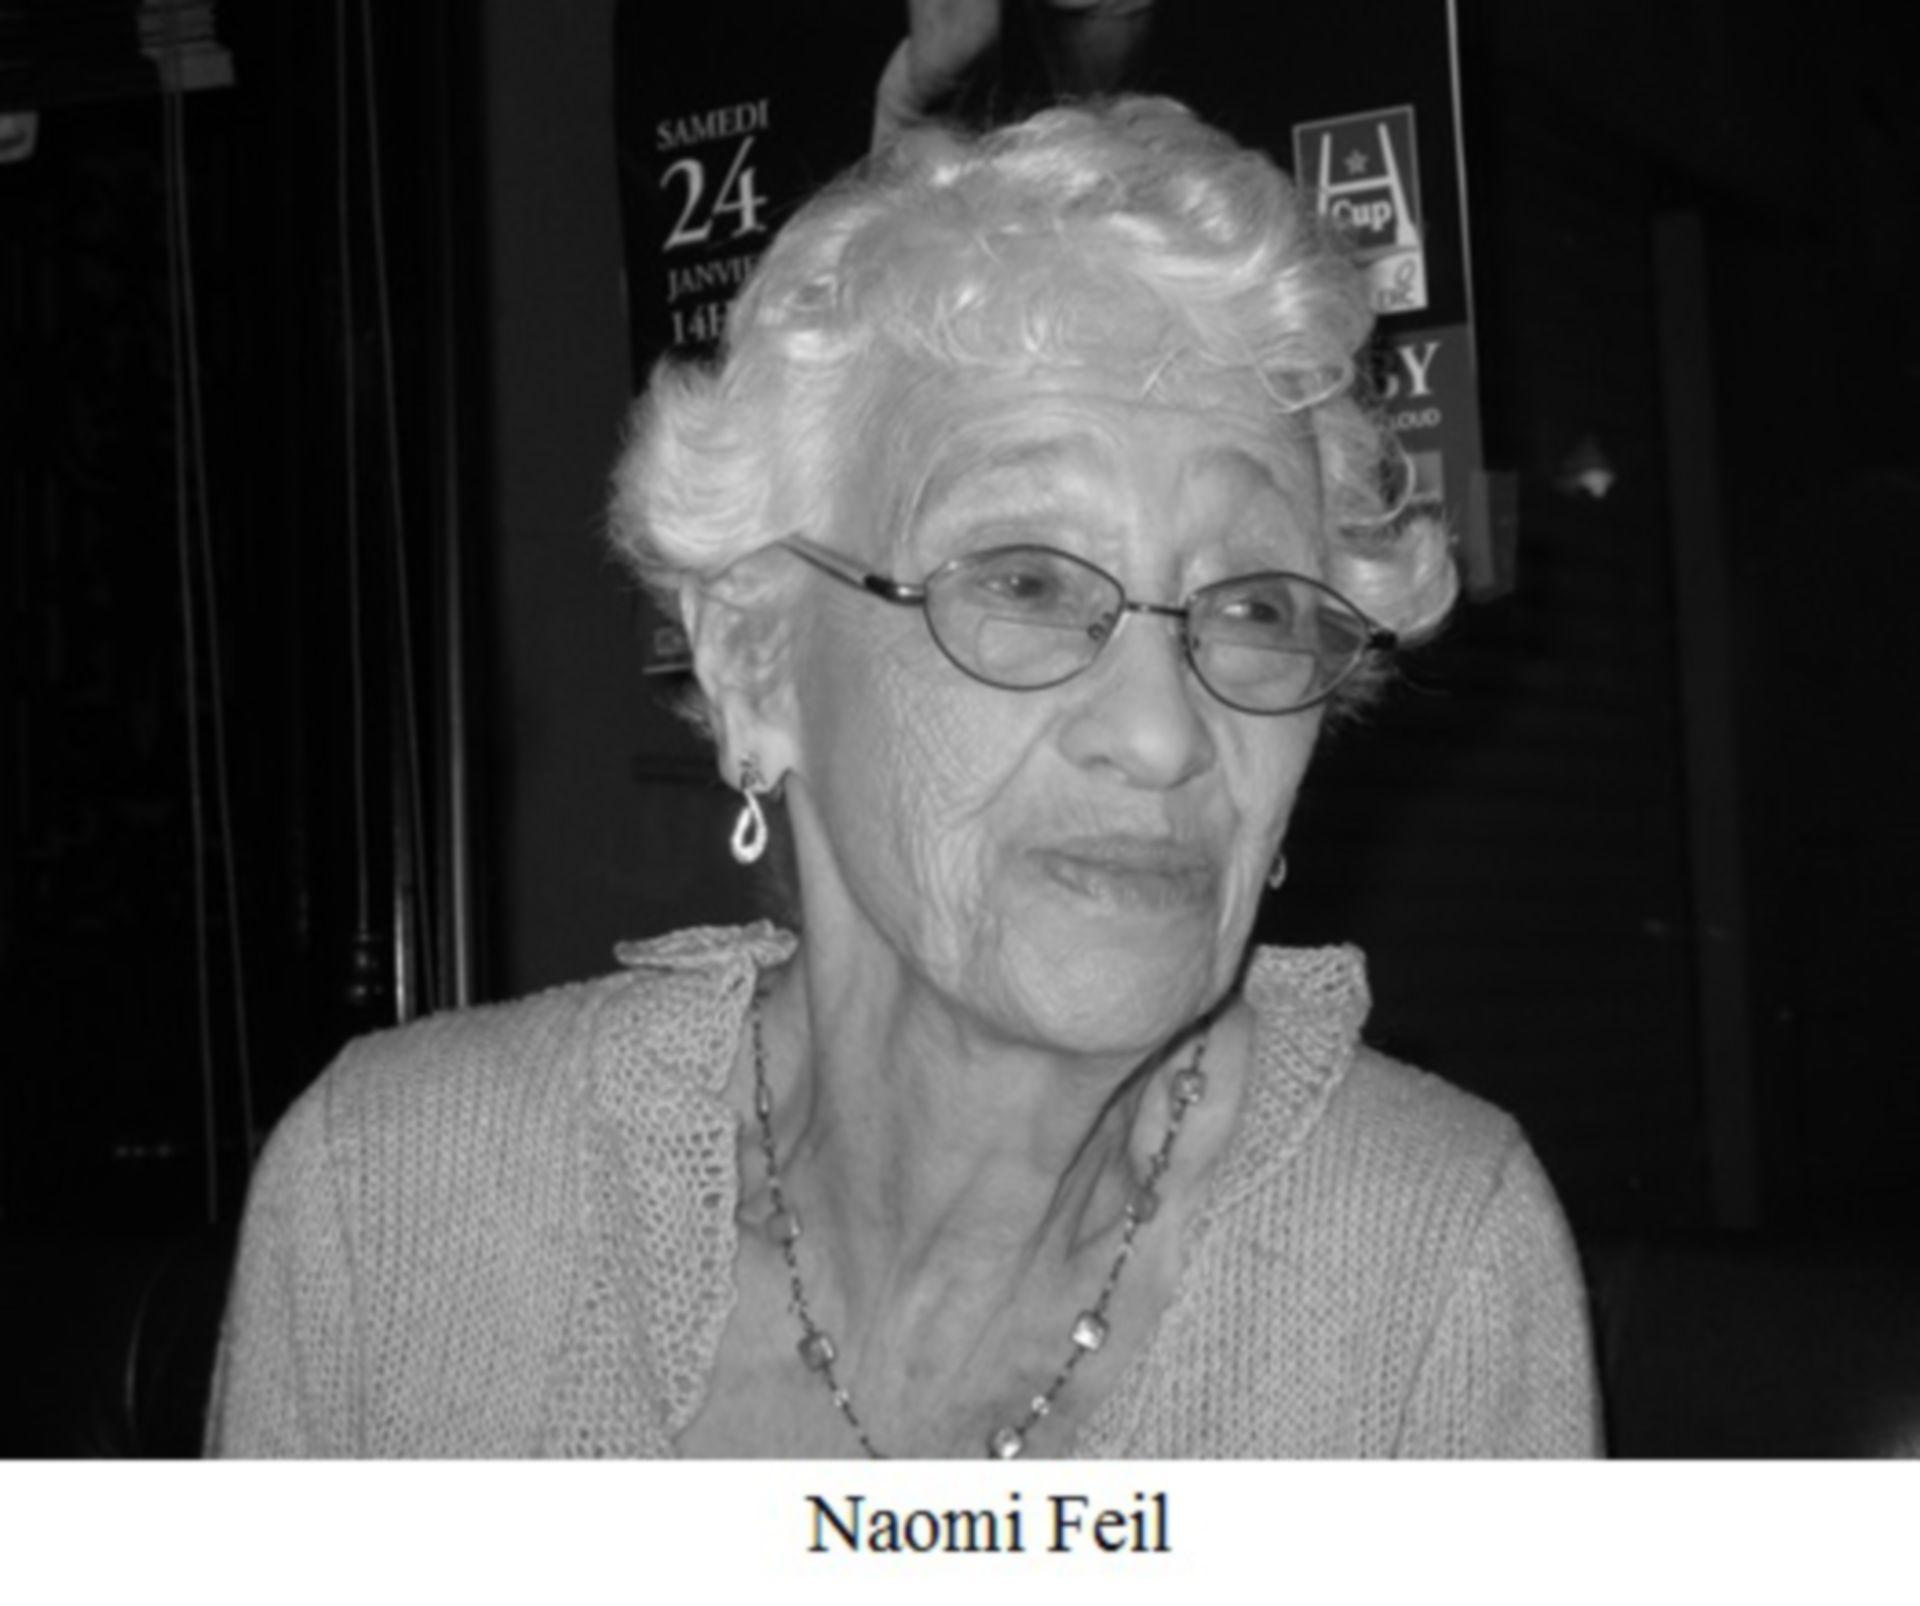 Naomi Feil